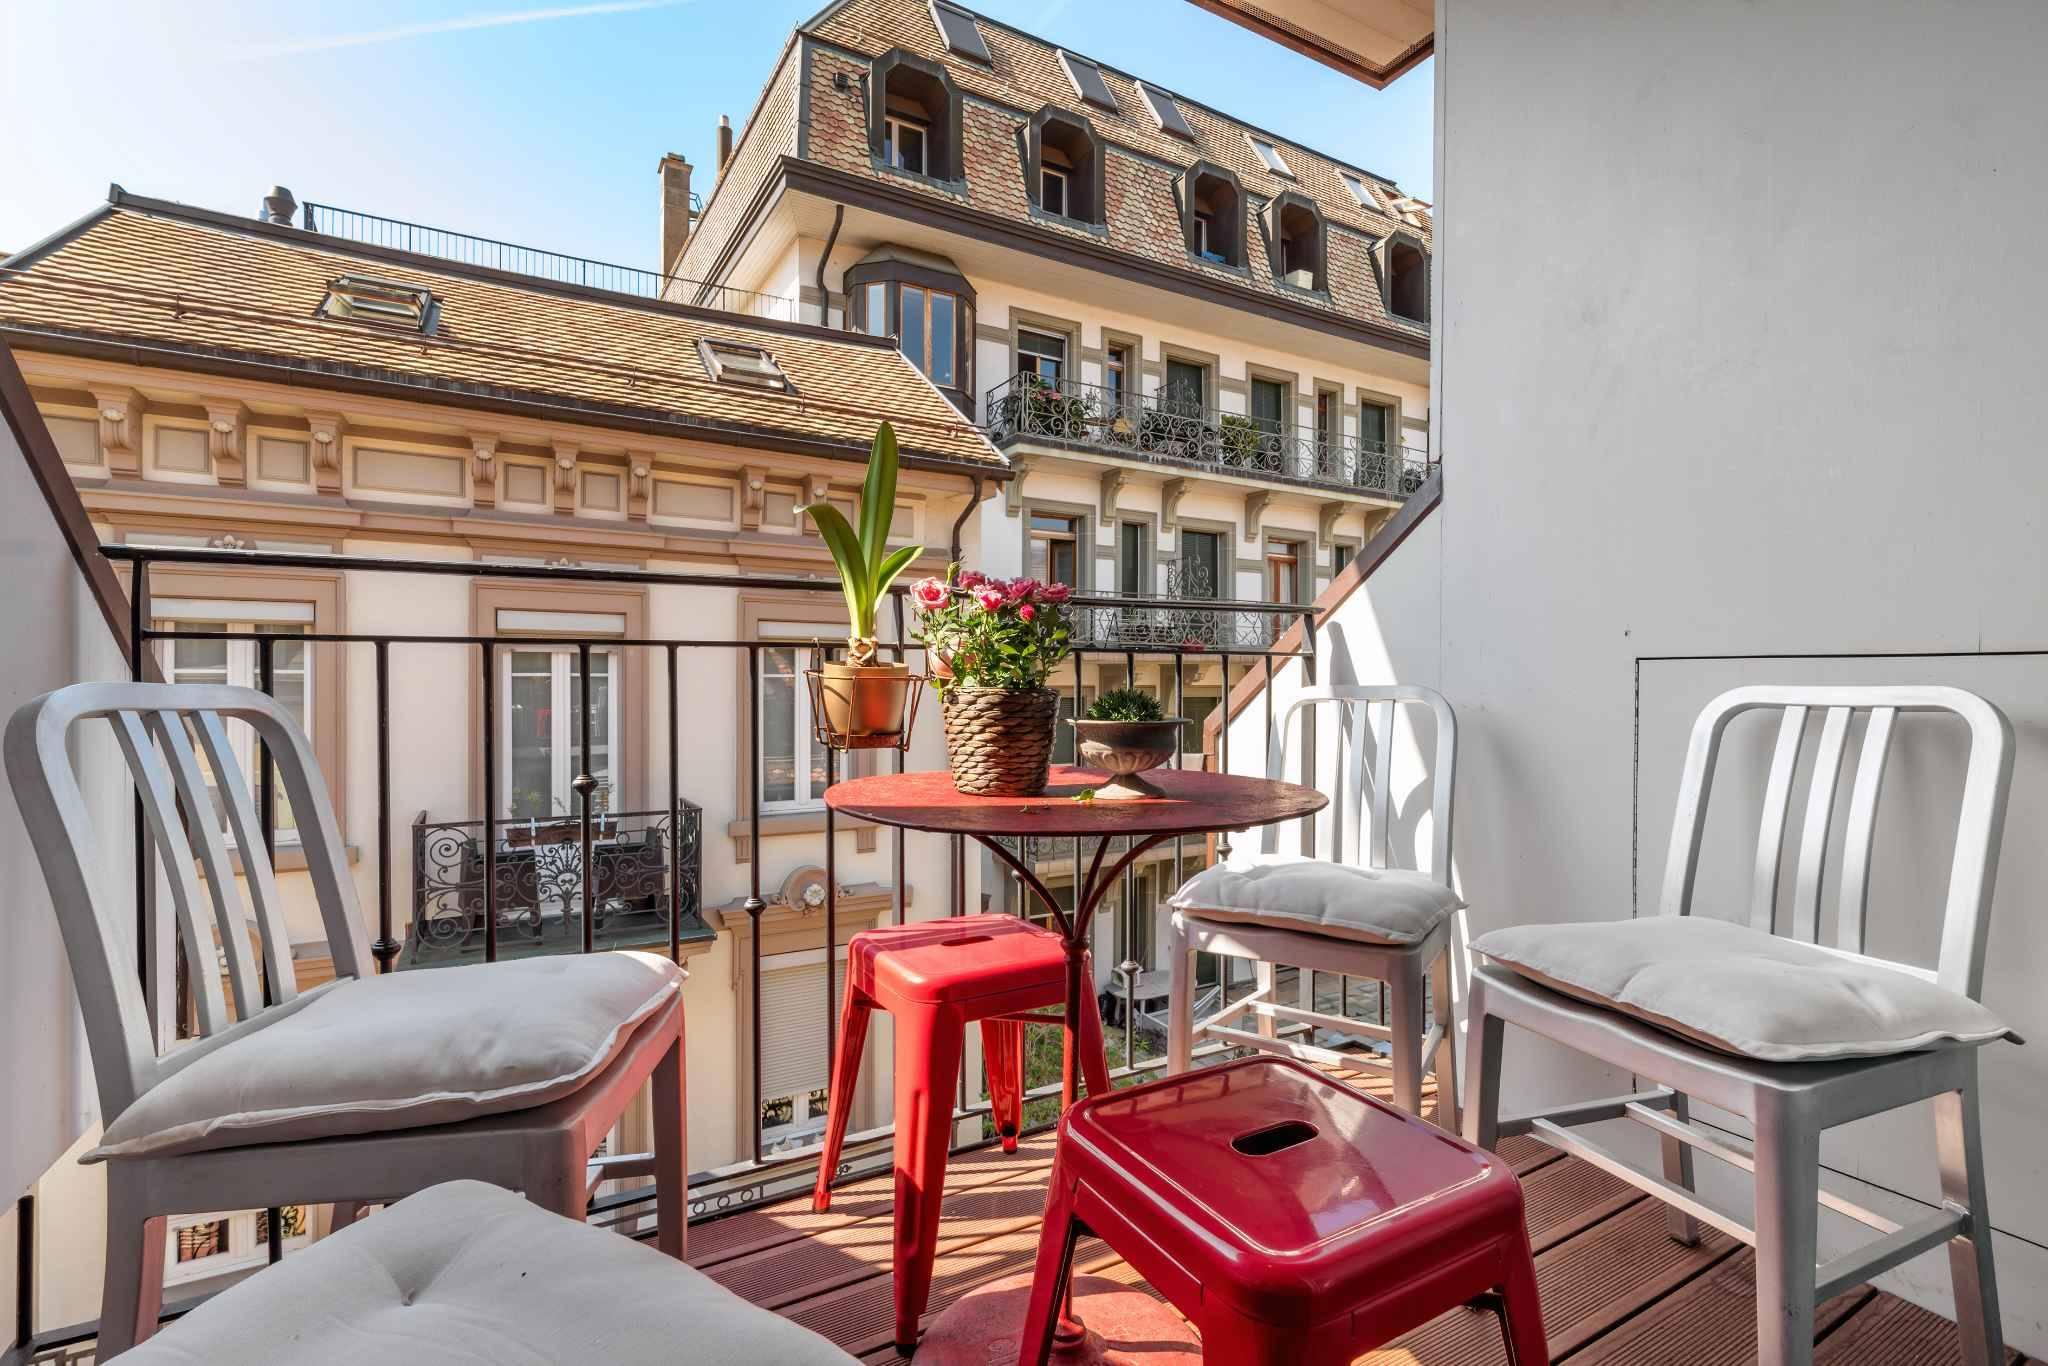 9.5-room triplex apartment